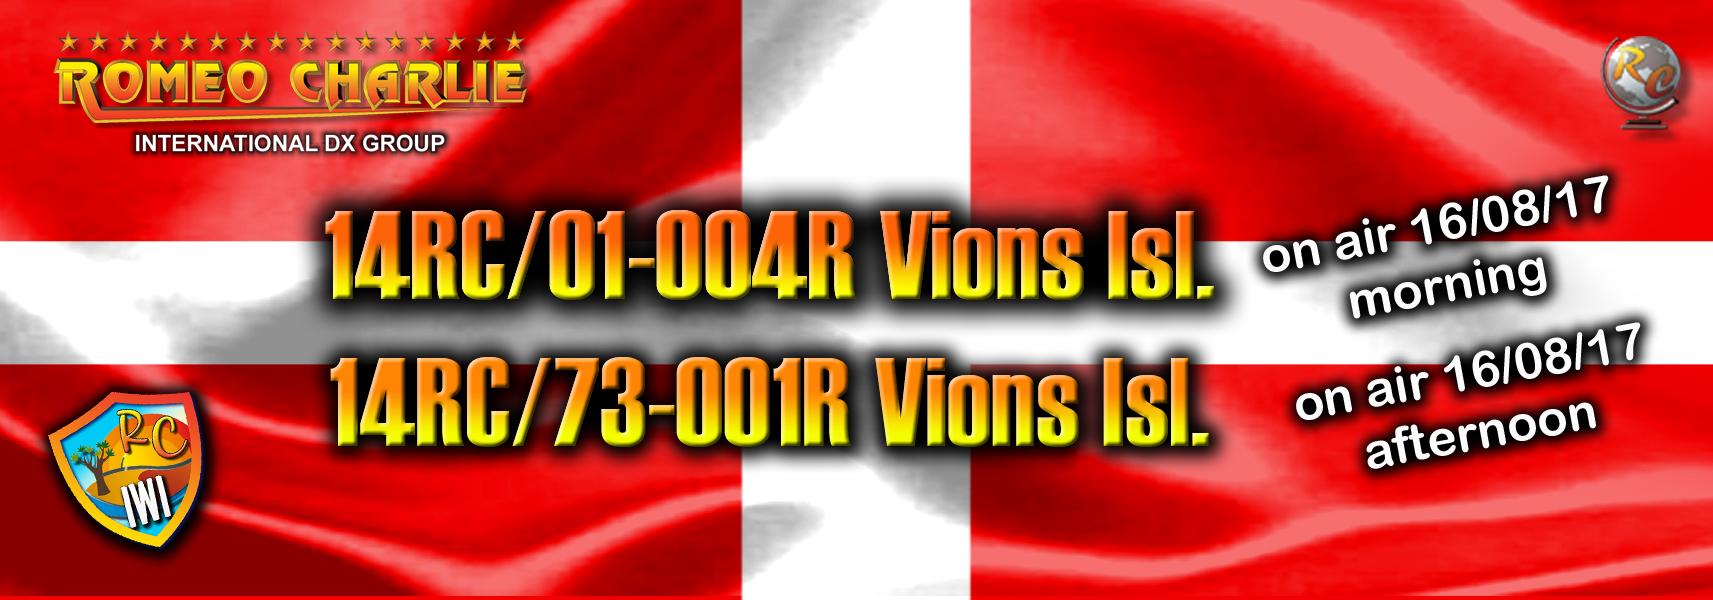 banner 14rc73-001r